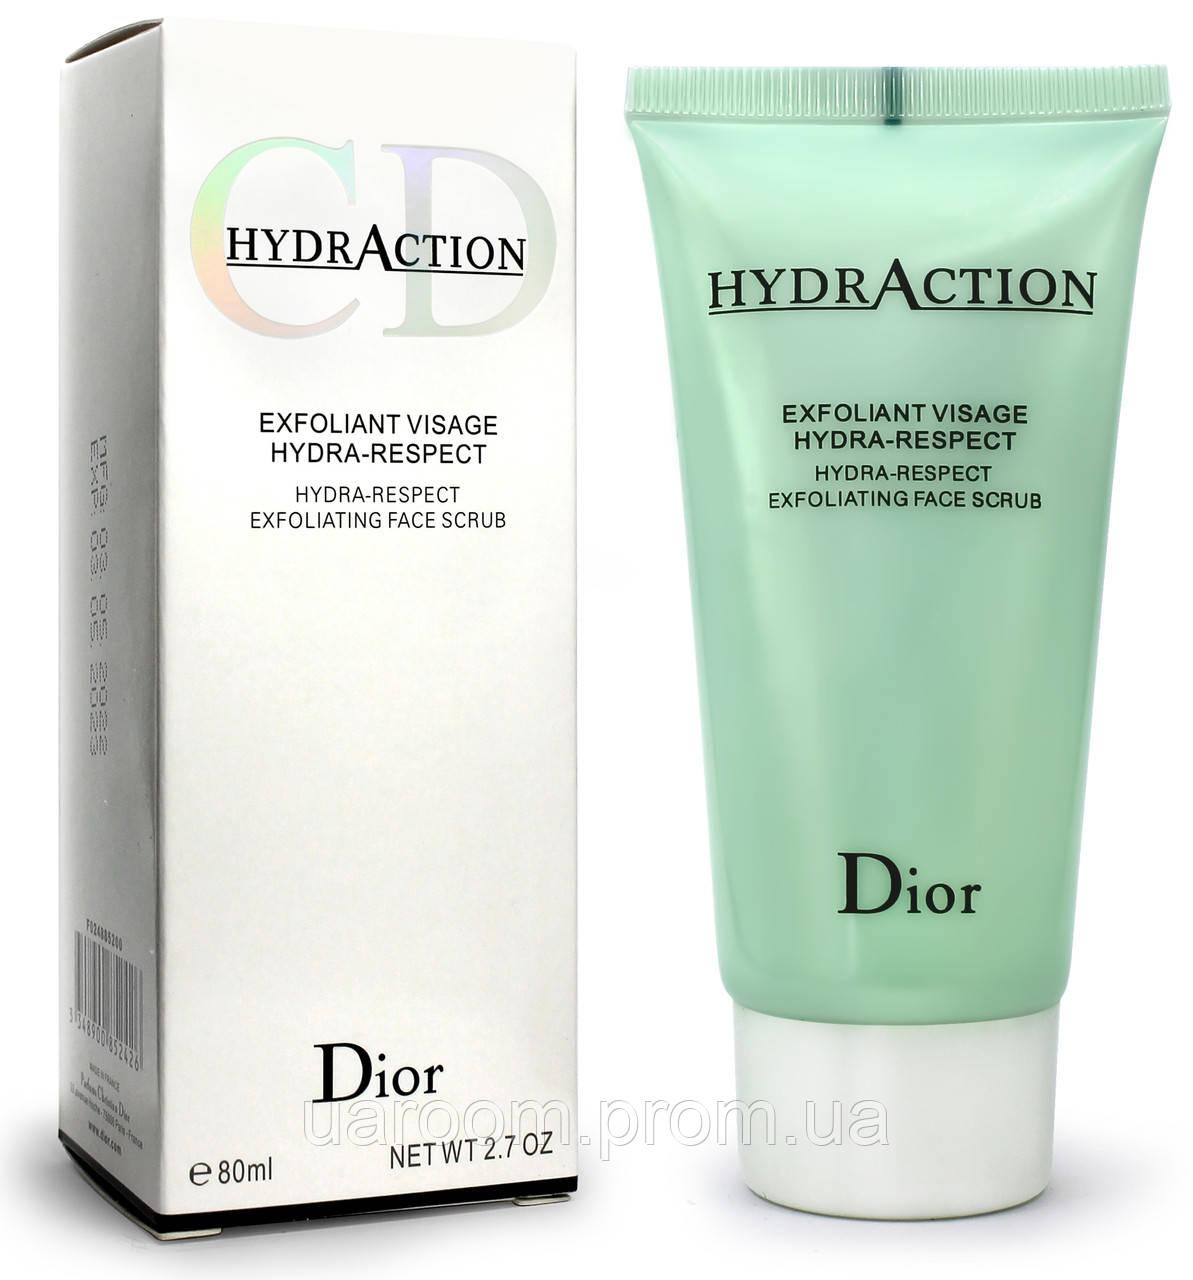 Гель-пілінг скатка для обличчя Dior HydrAction, 80 мл.(примята упаковка)